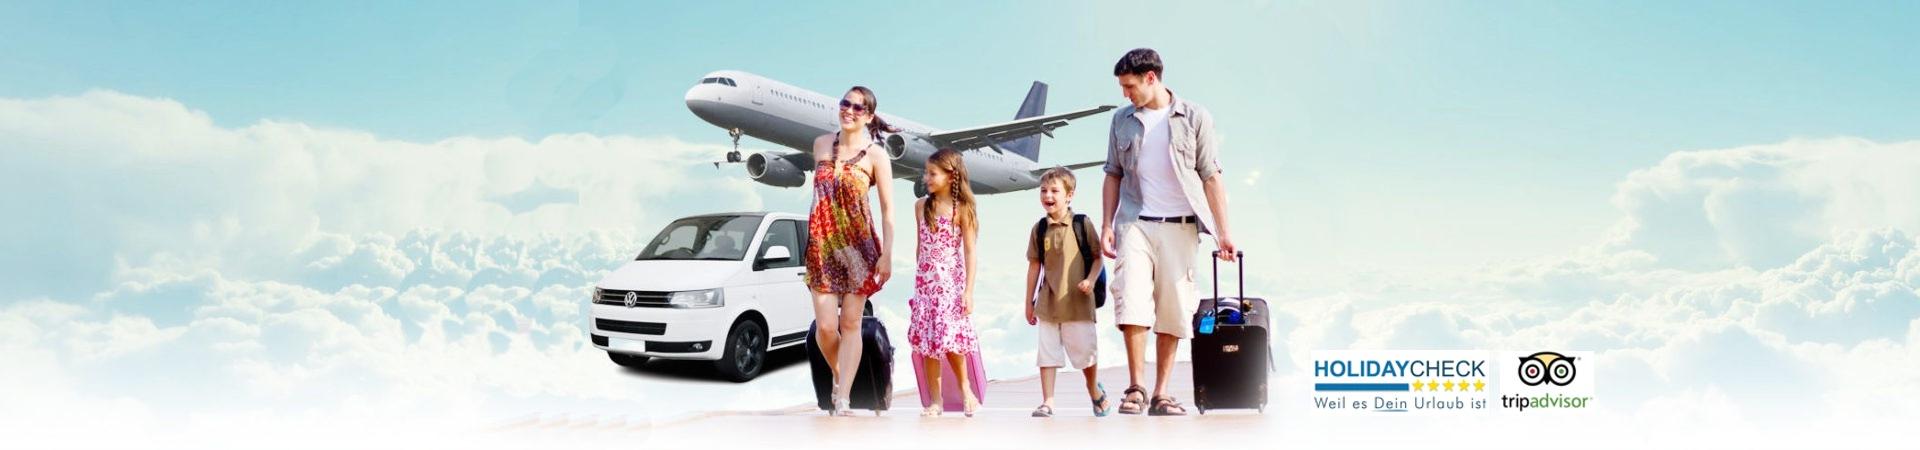 Flughafen Transfer in Antalya, Mallorca, Hurghada, Phuket, Bangkok